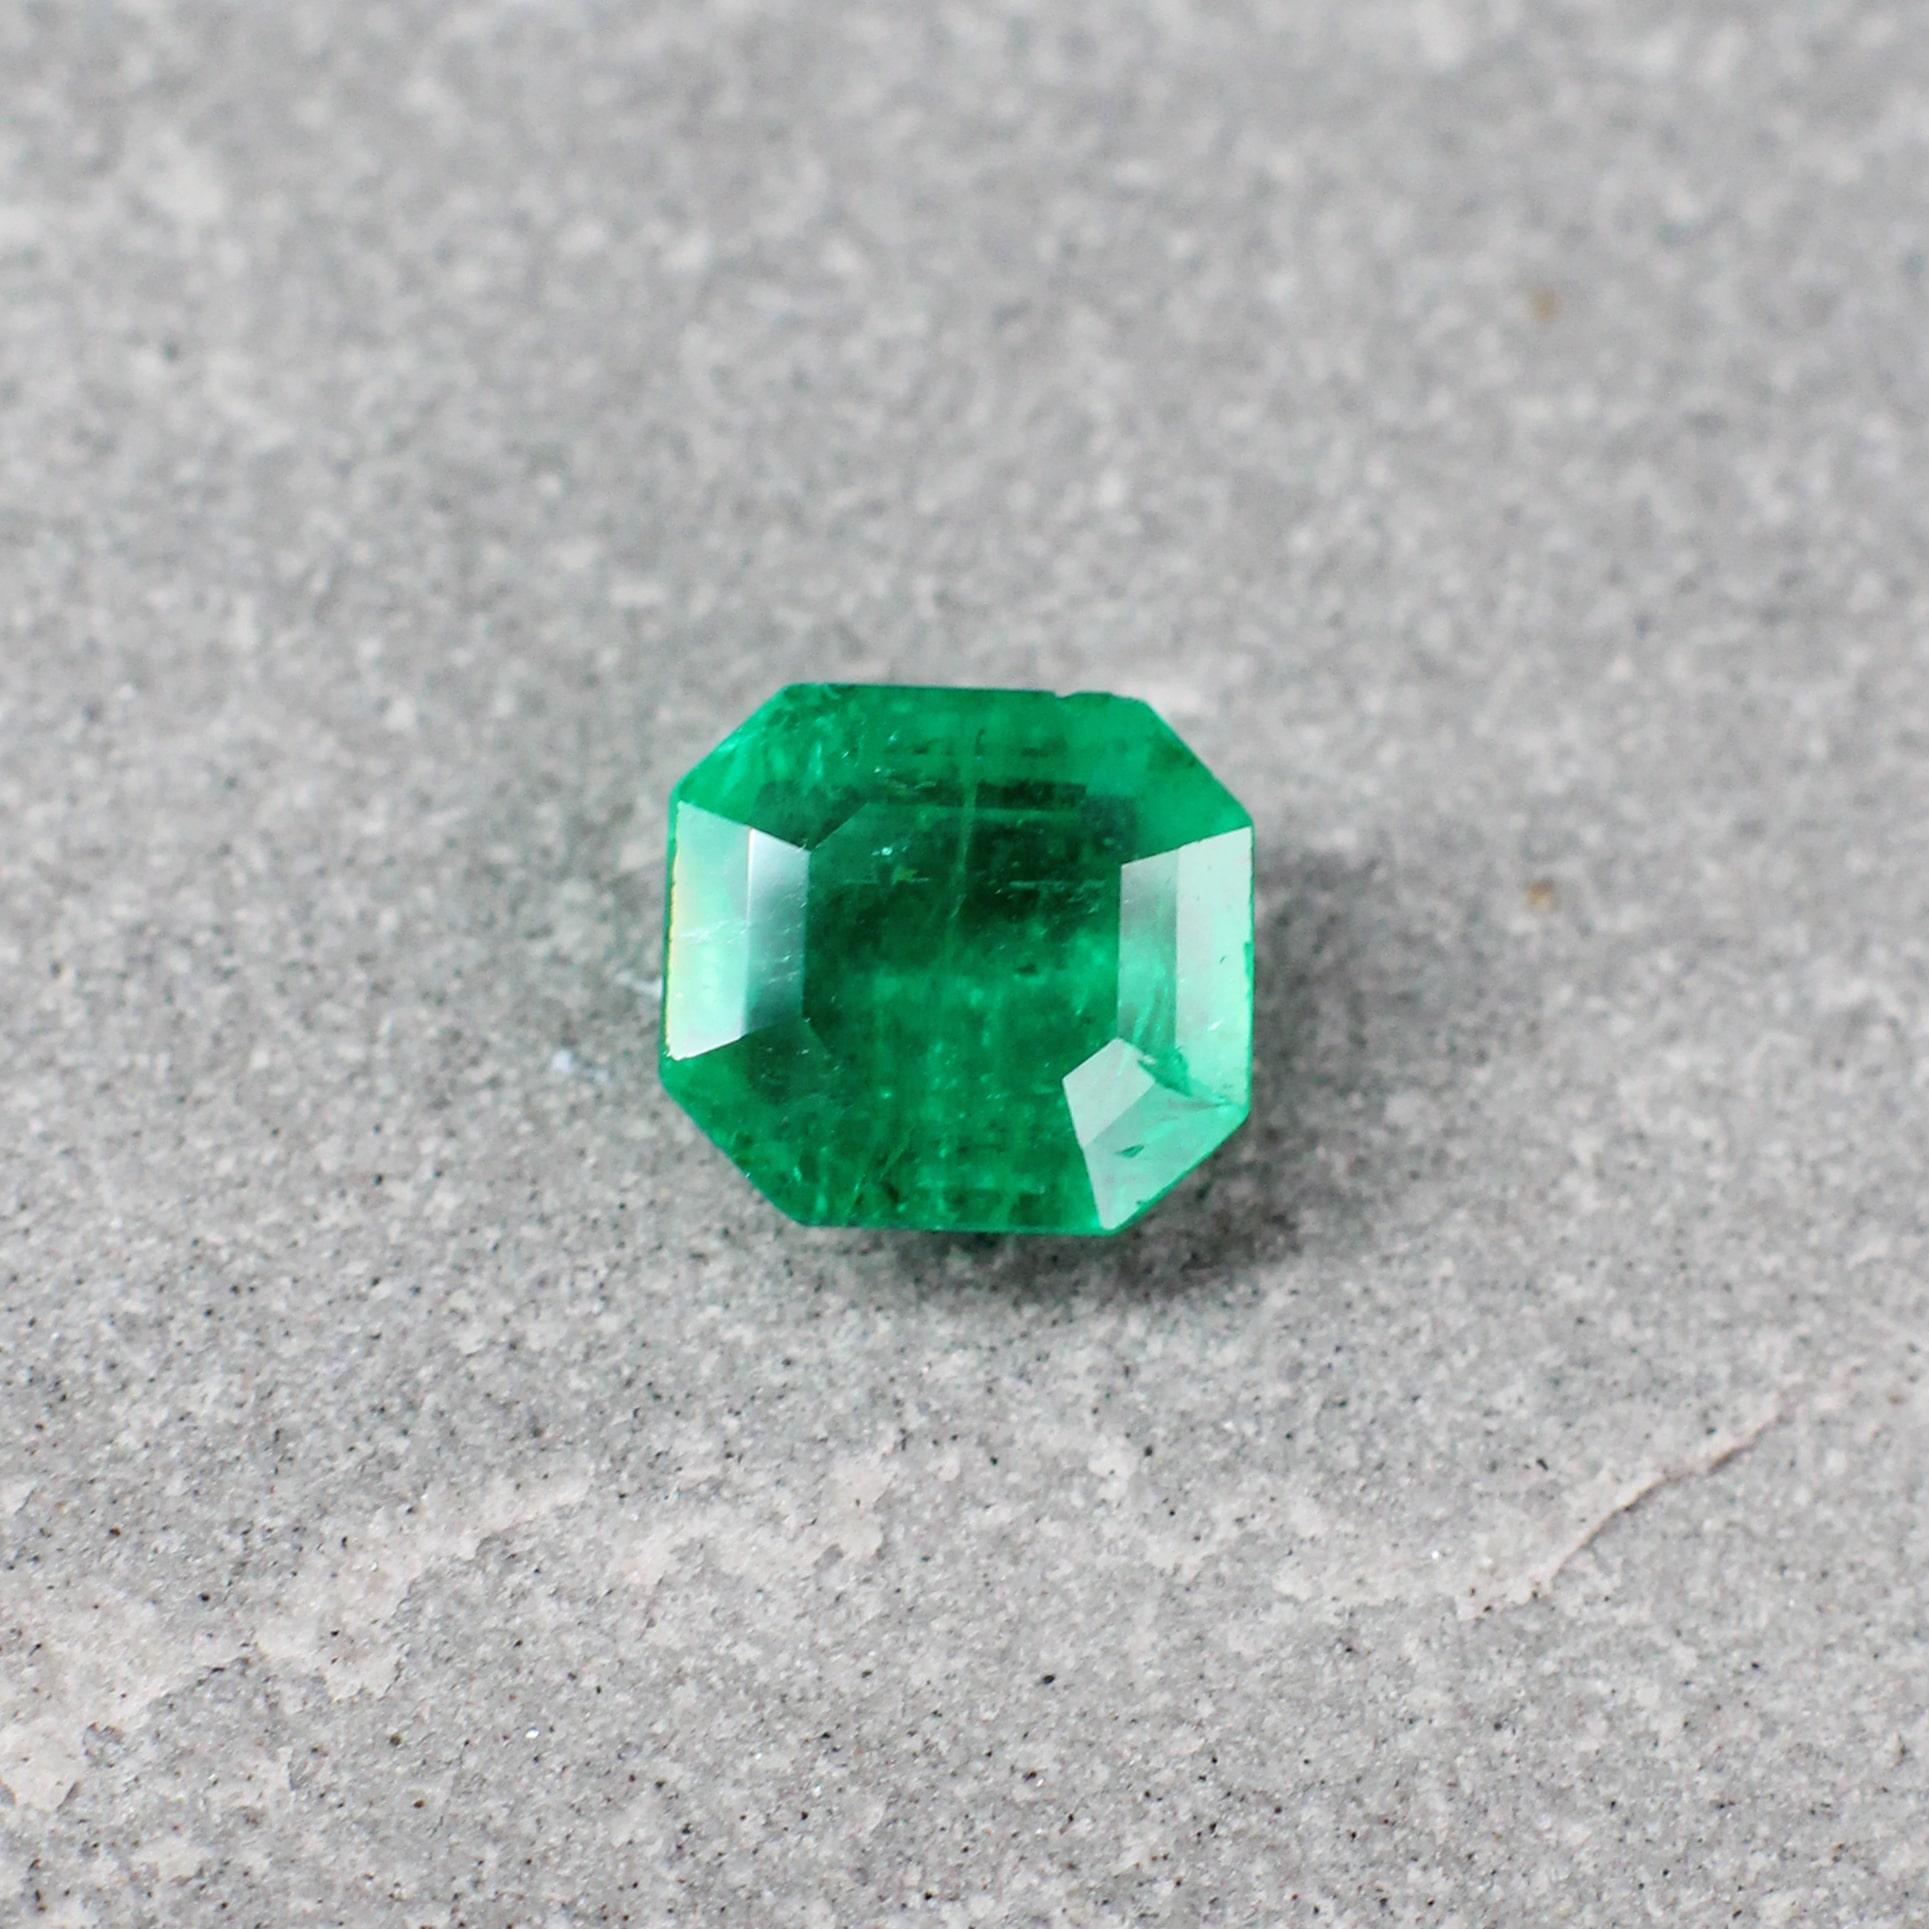 1.34 ct emerald cut green emerald